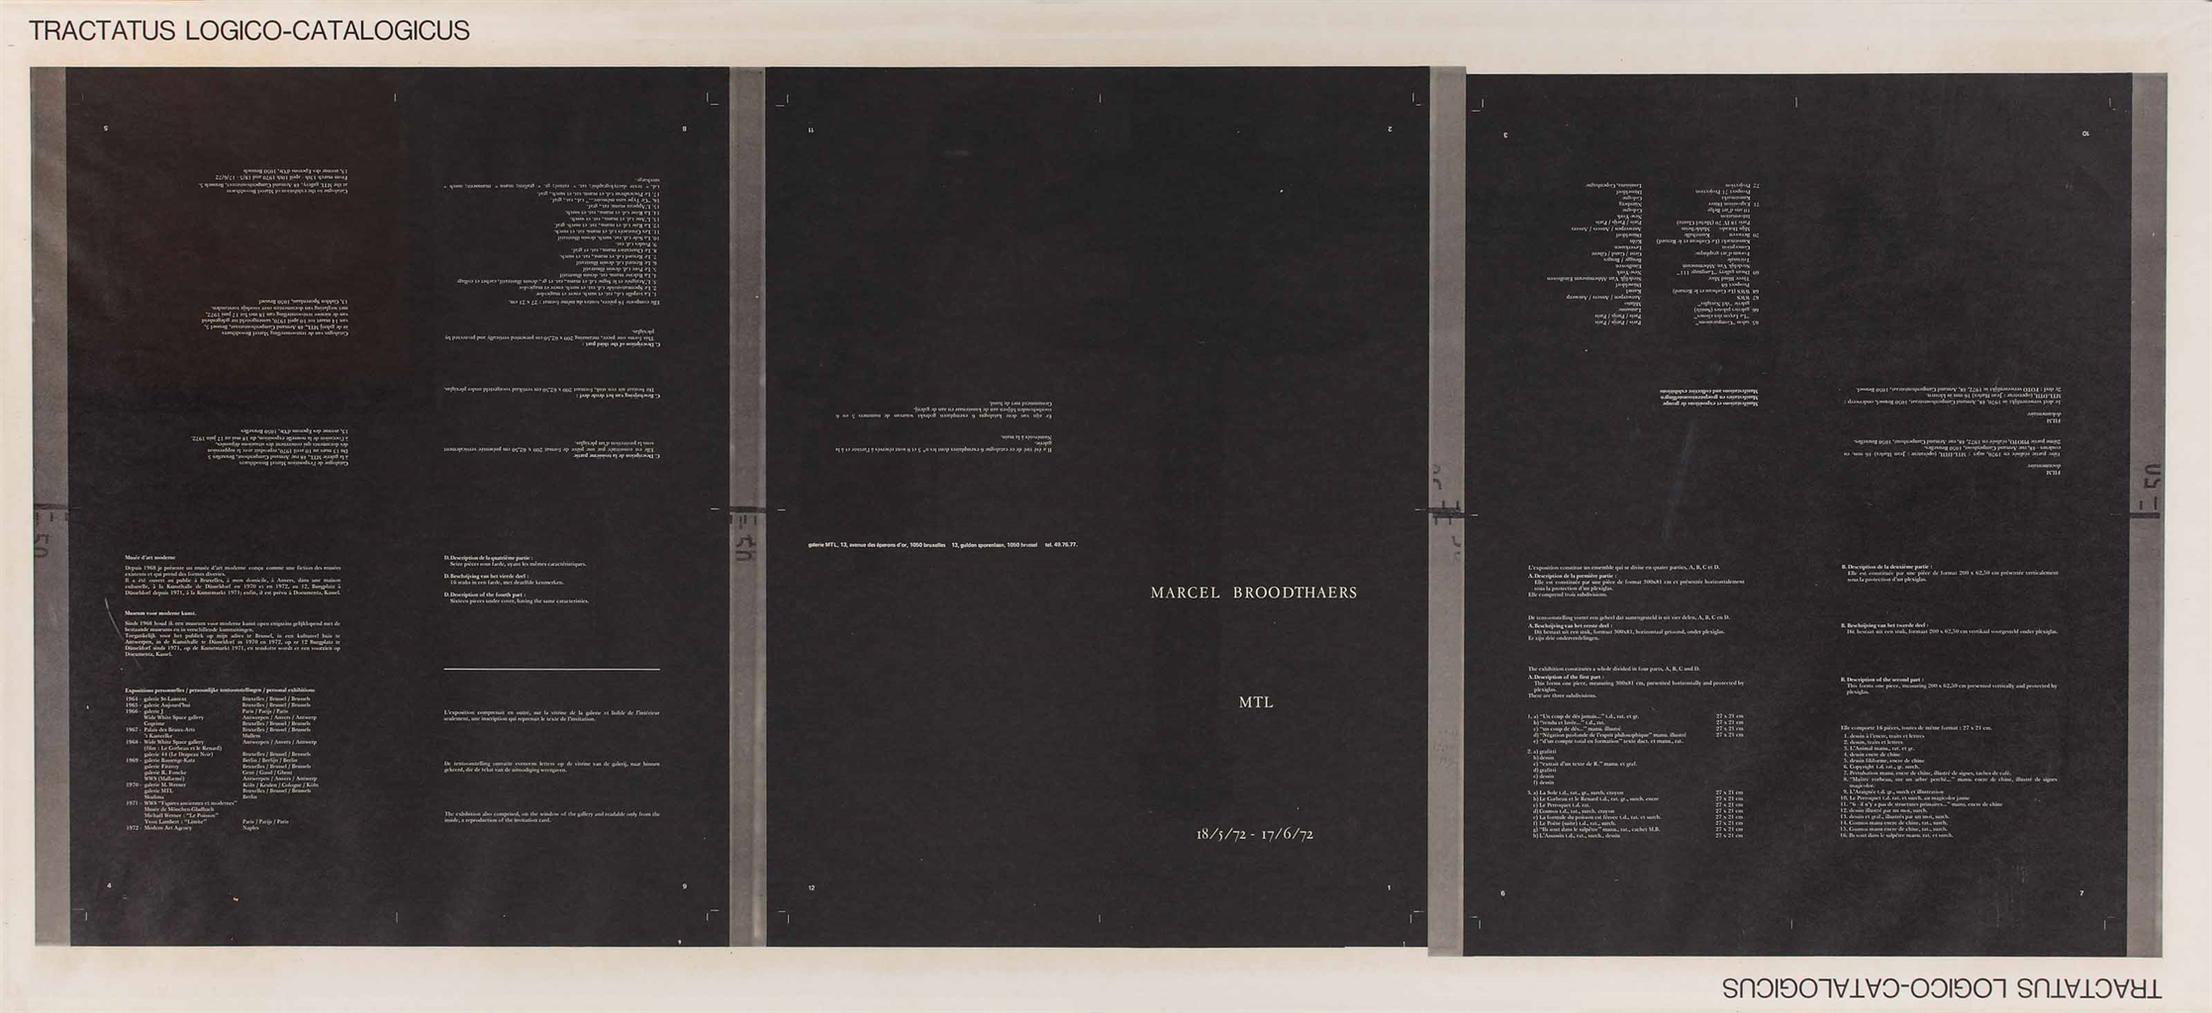 Marcel Broodthaers-Tractatus Logico-Catalogicus-1972